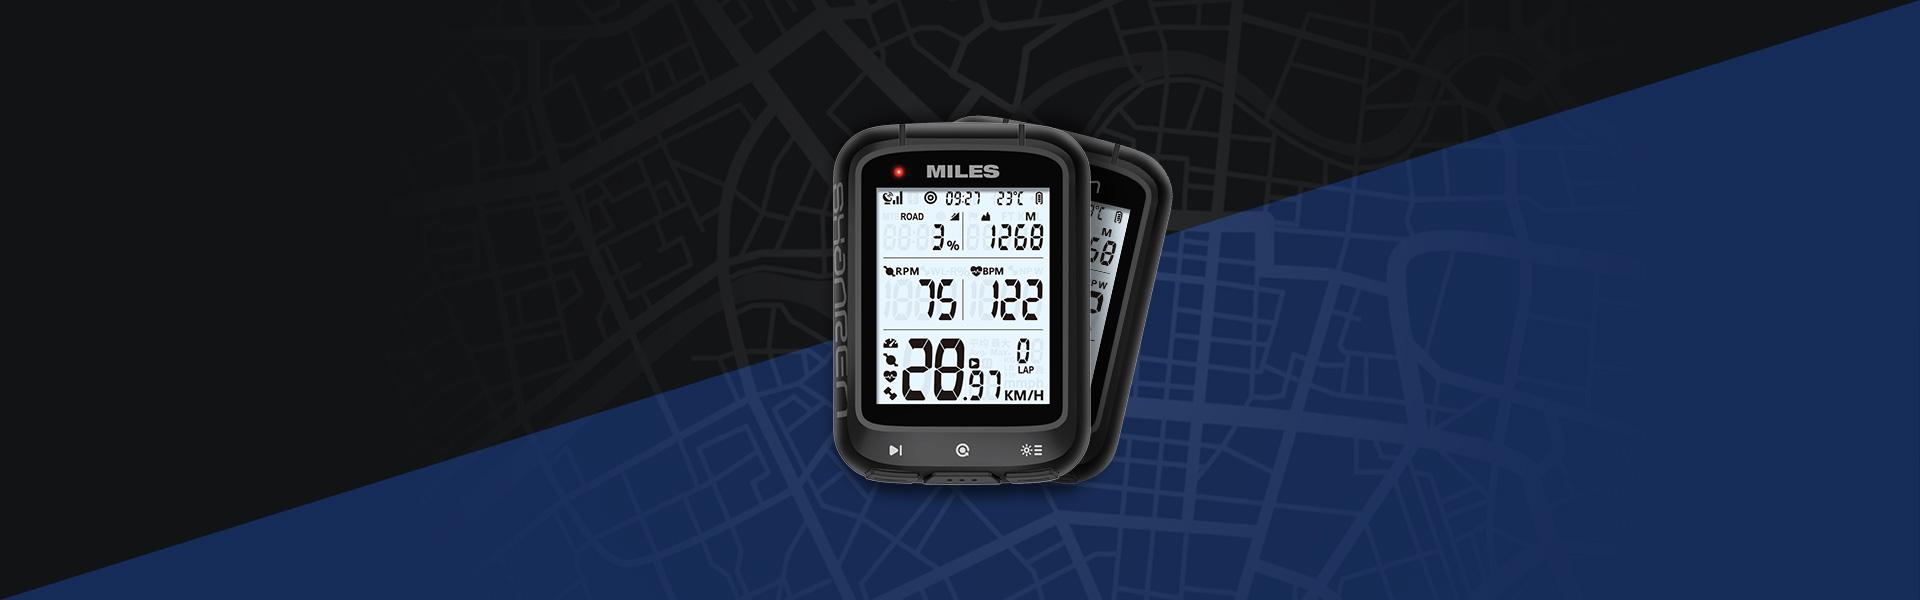 MILES GPS BIKE COMPUTER